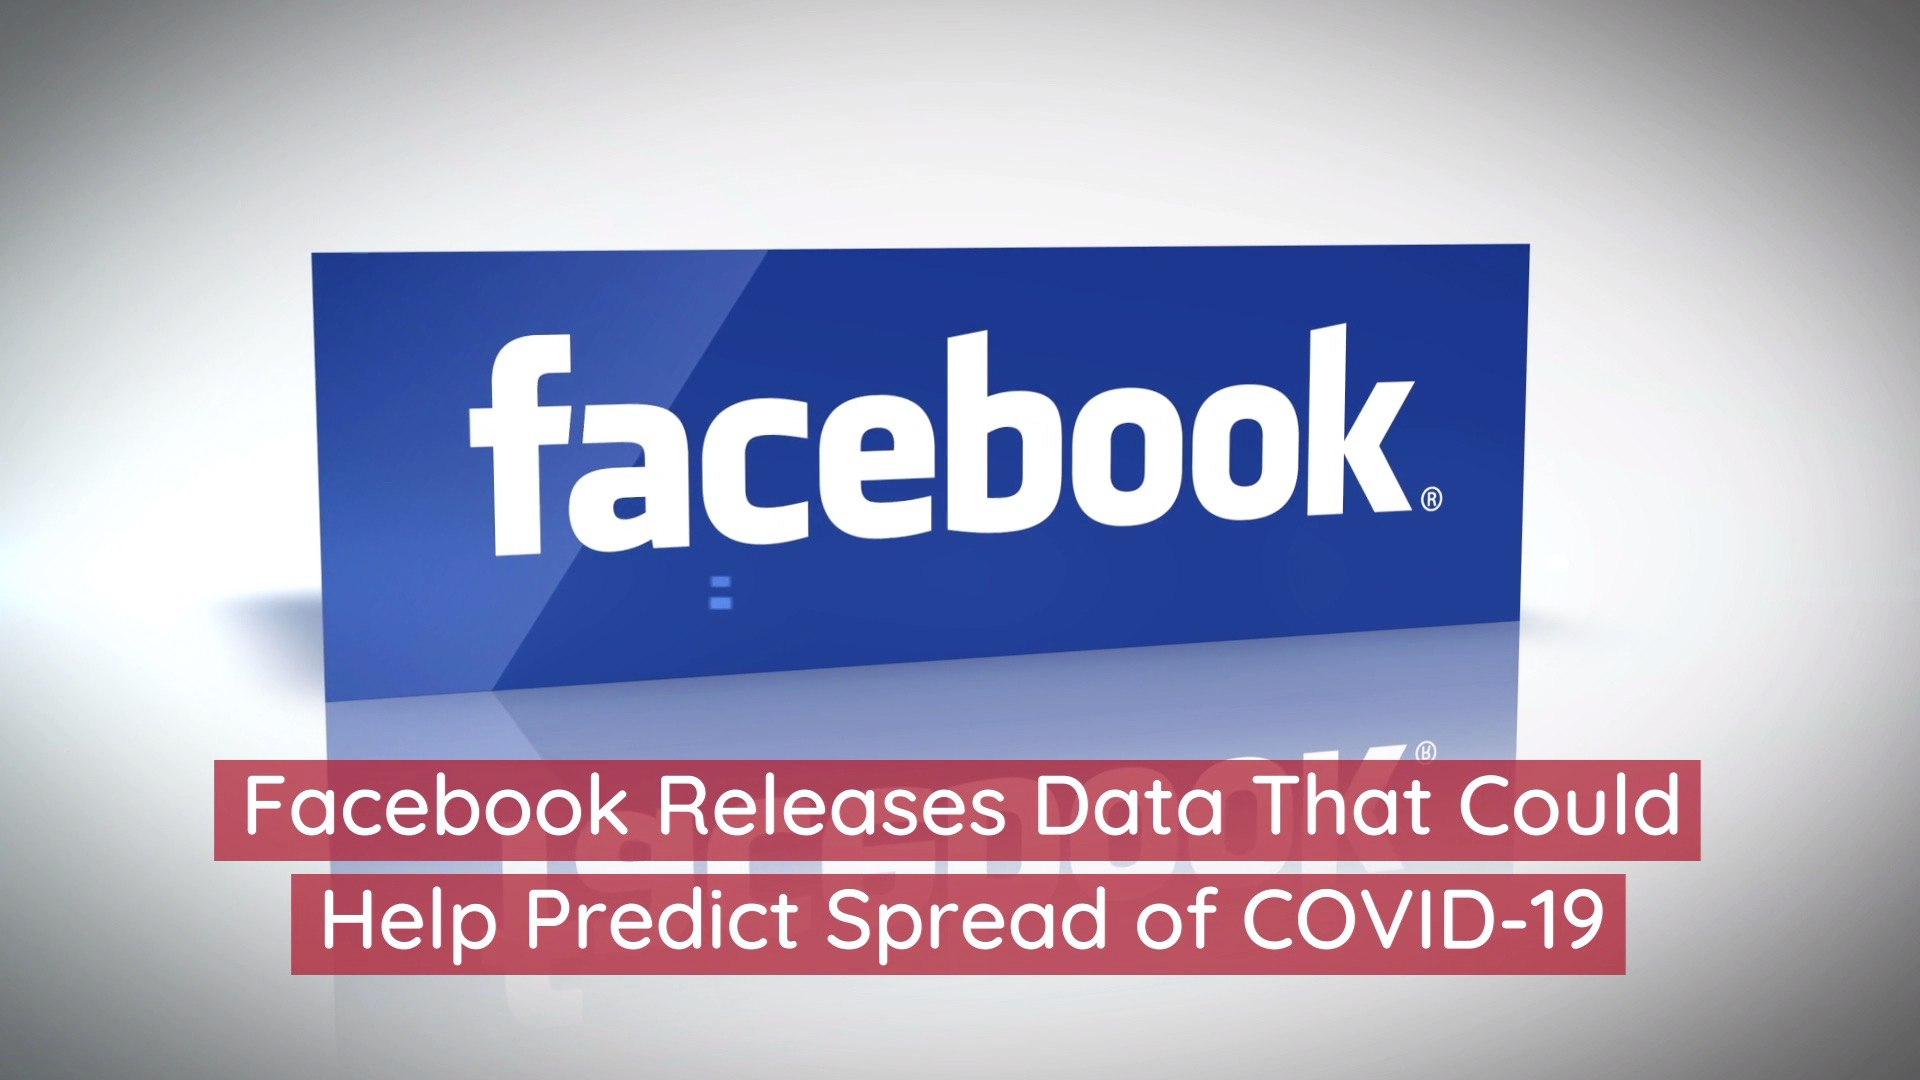 Facebook Covid-19 Data